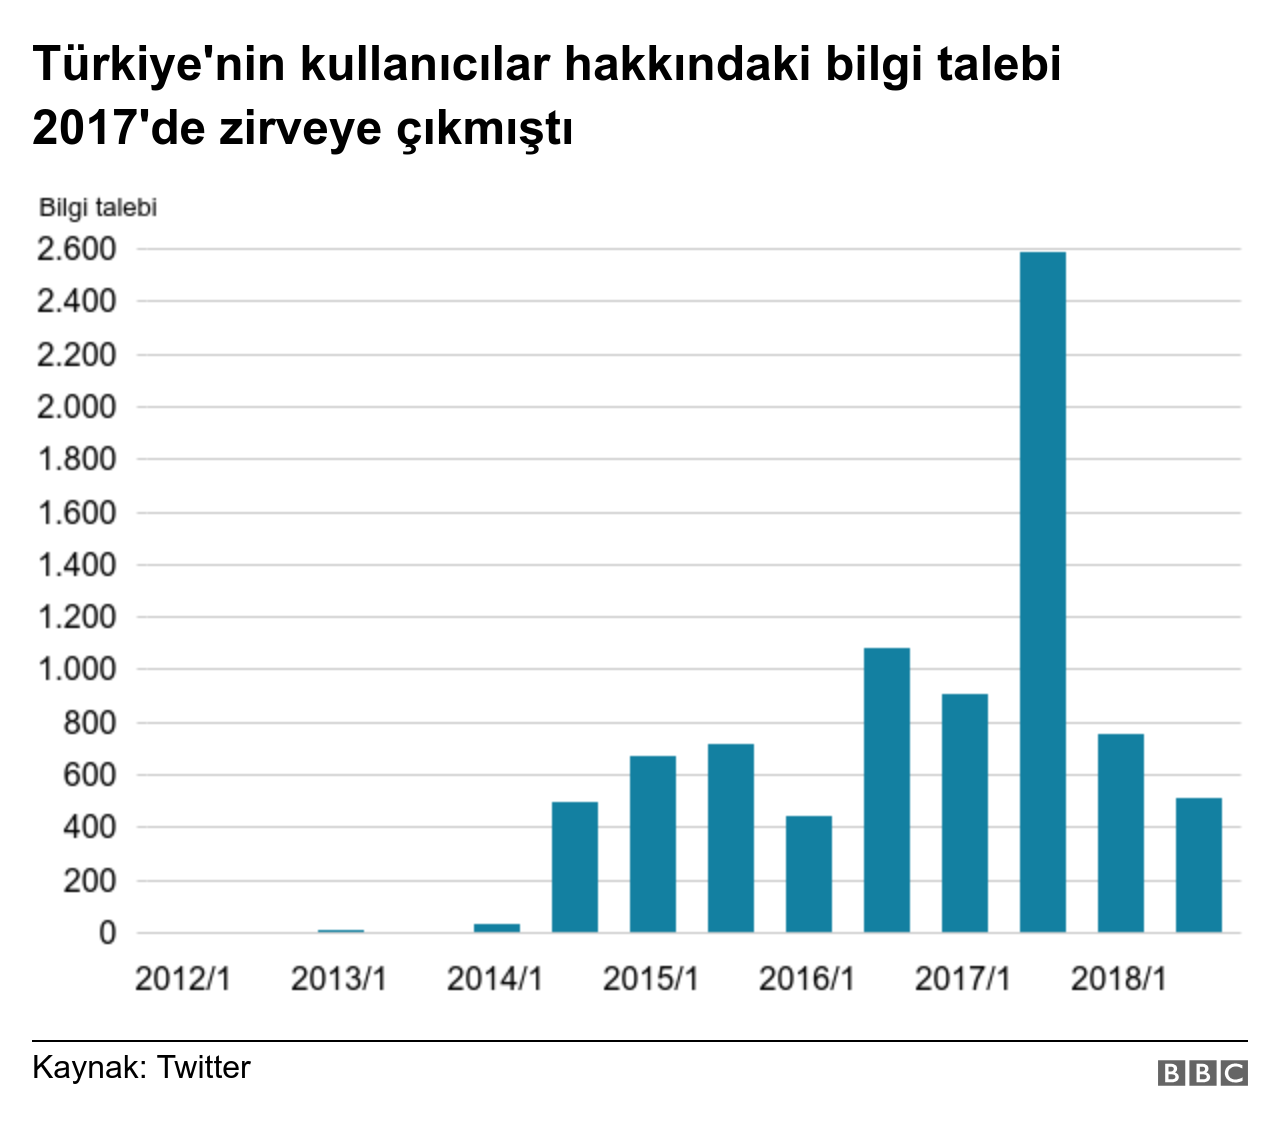 Twitter grafik